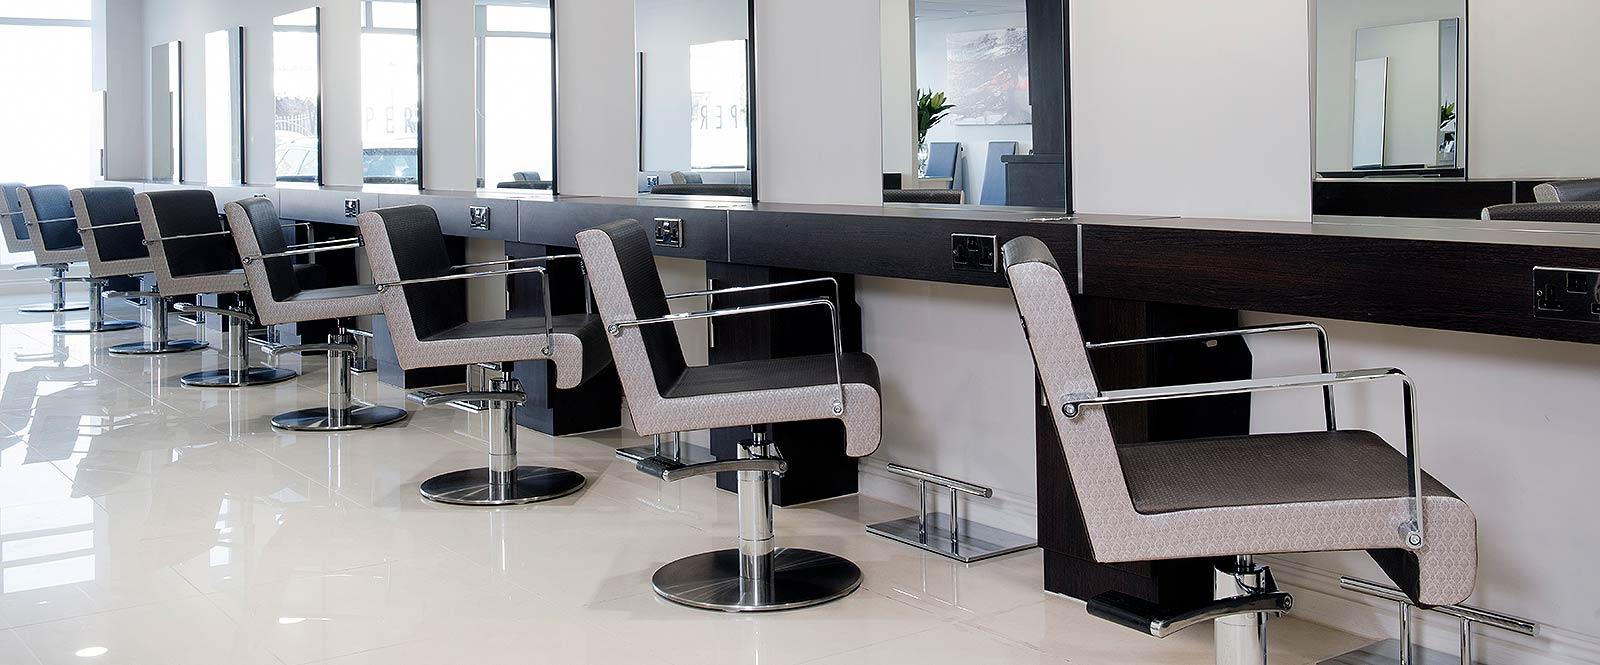 REM Salon, Barbering and Spa Furniture